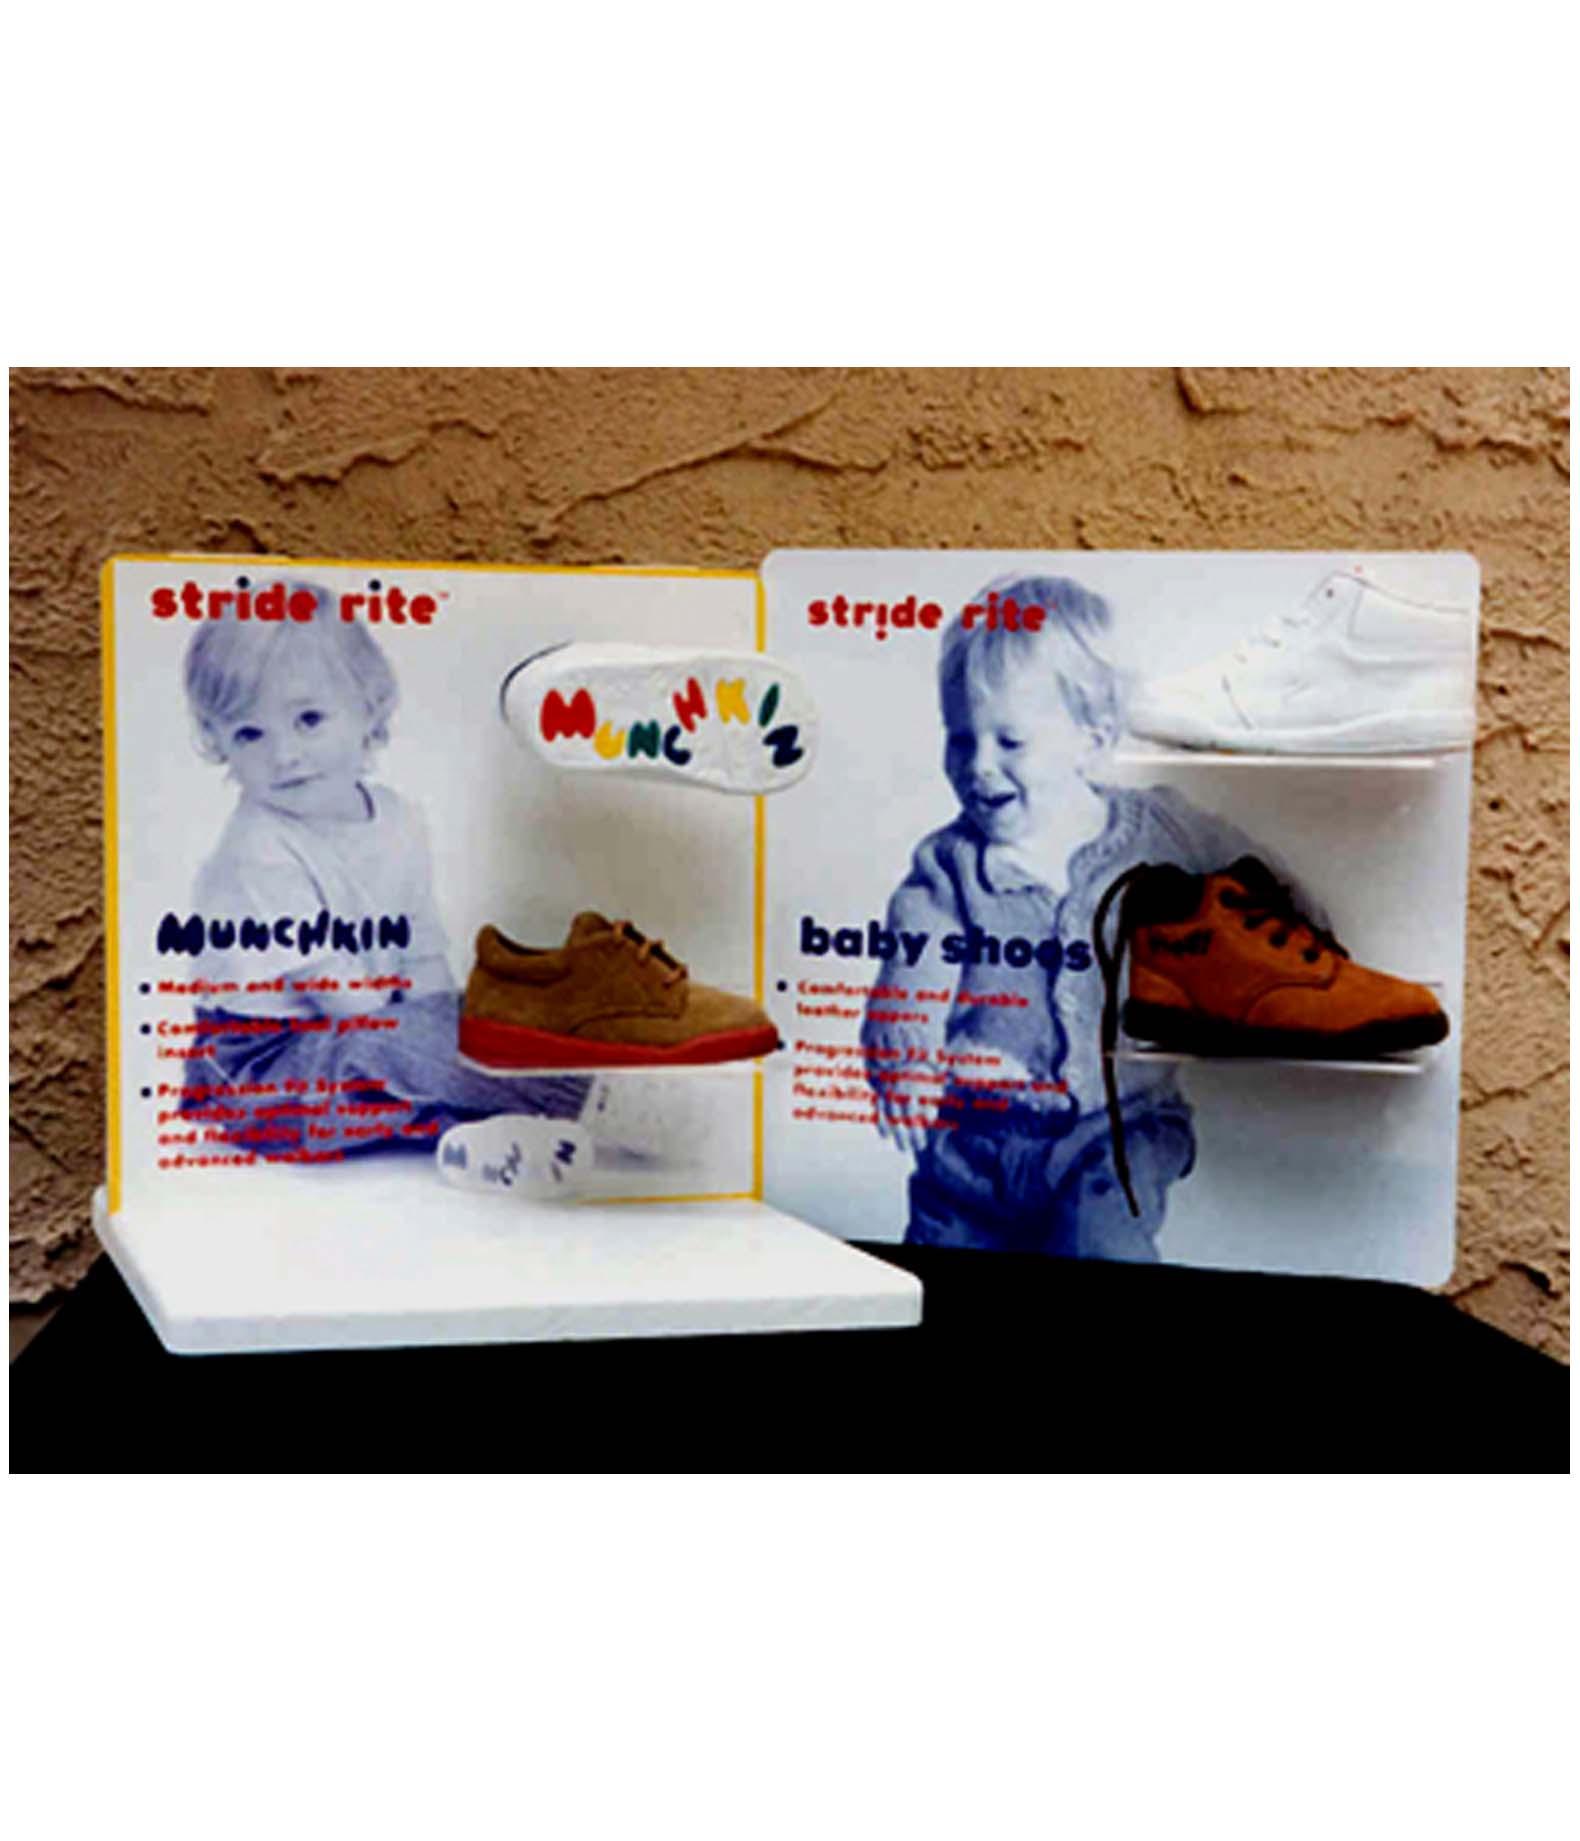 Retail - The Total Shoe Program